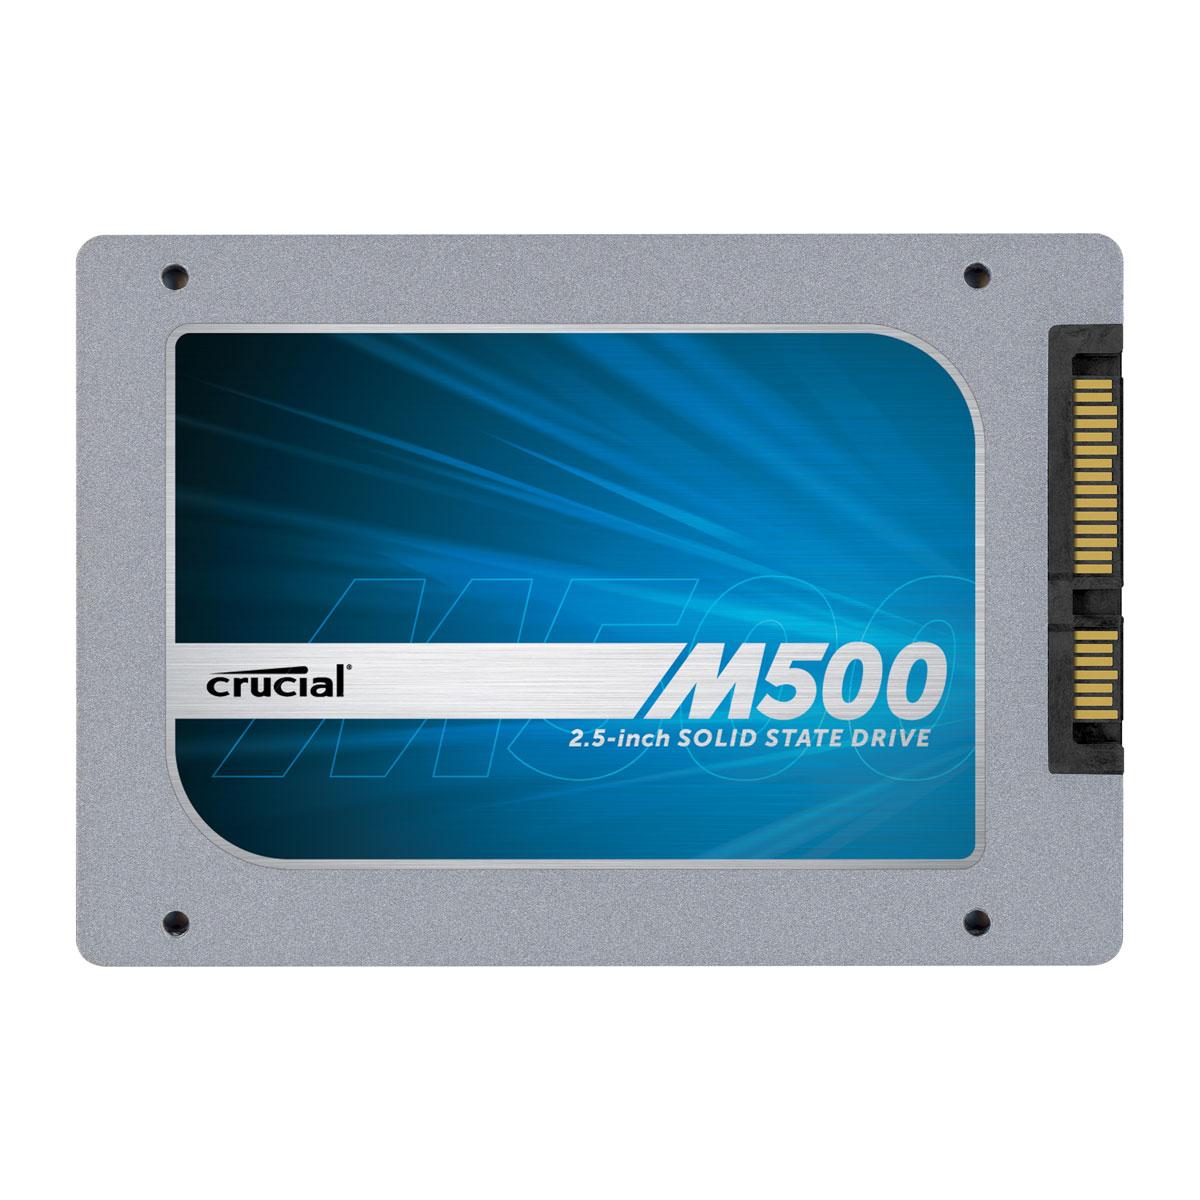 "Disque SSD Crucial M500 960 Go SSD 960 Go 2.5"" 7mm Serial ATA 6Gb/s"